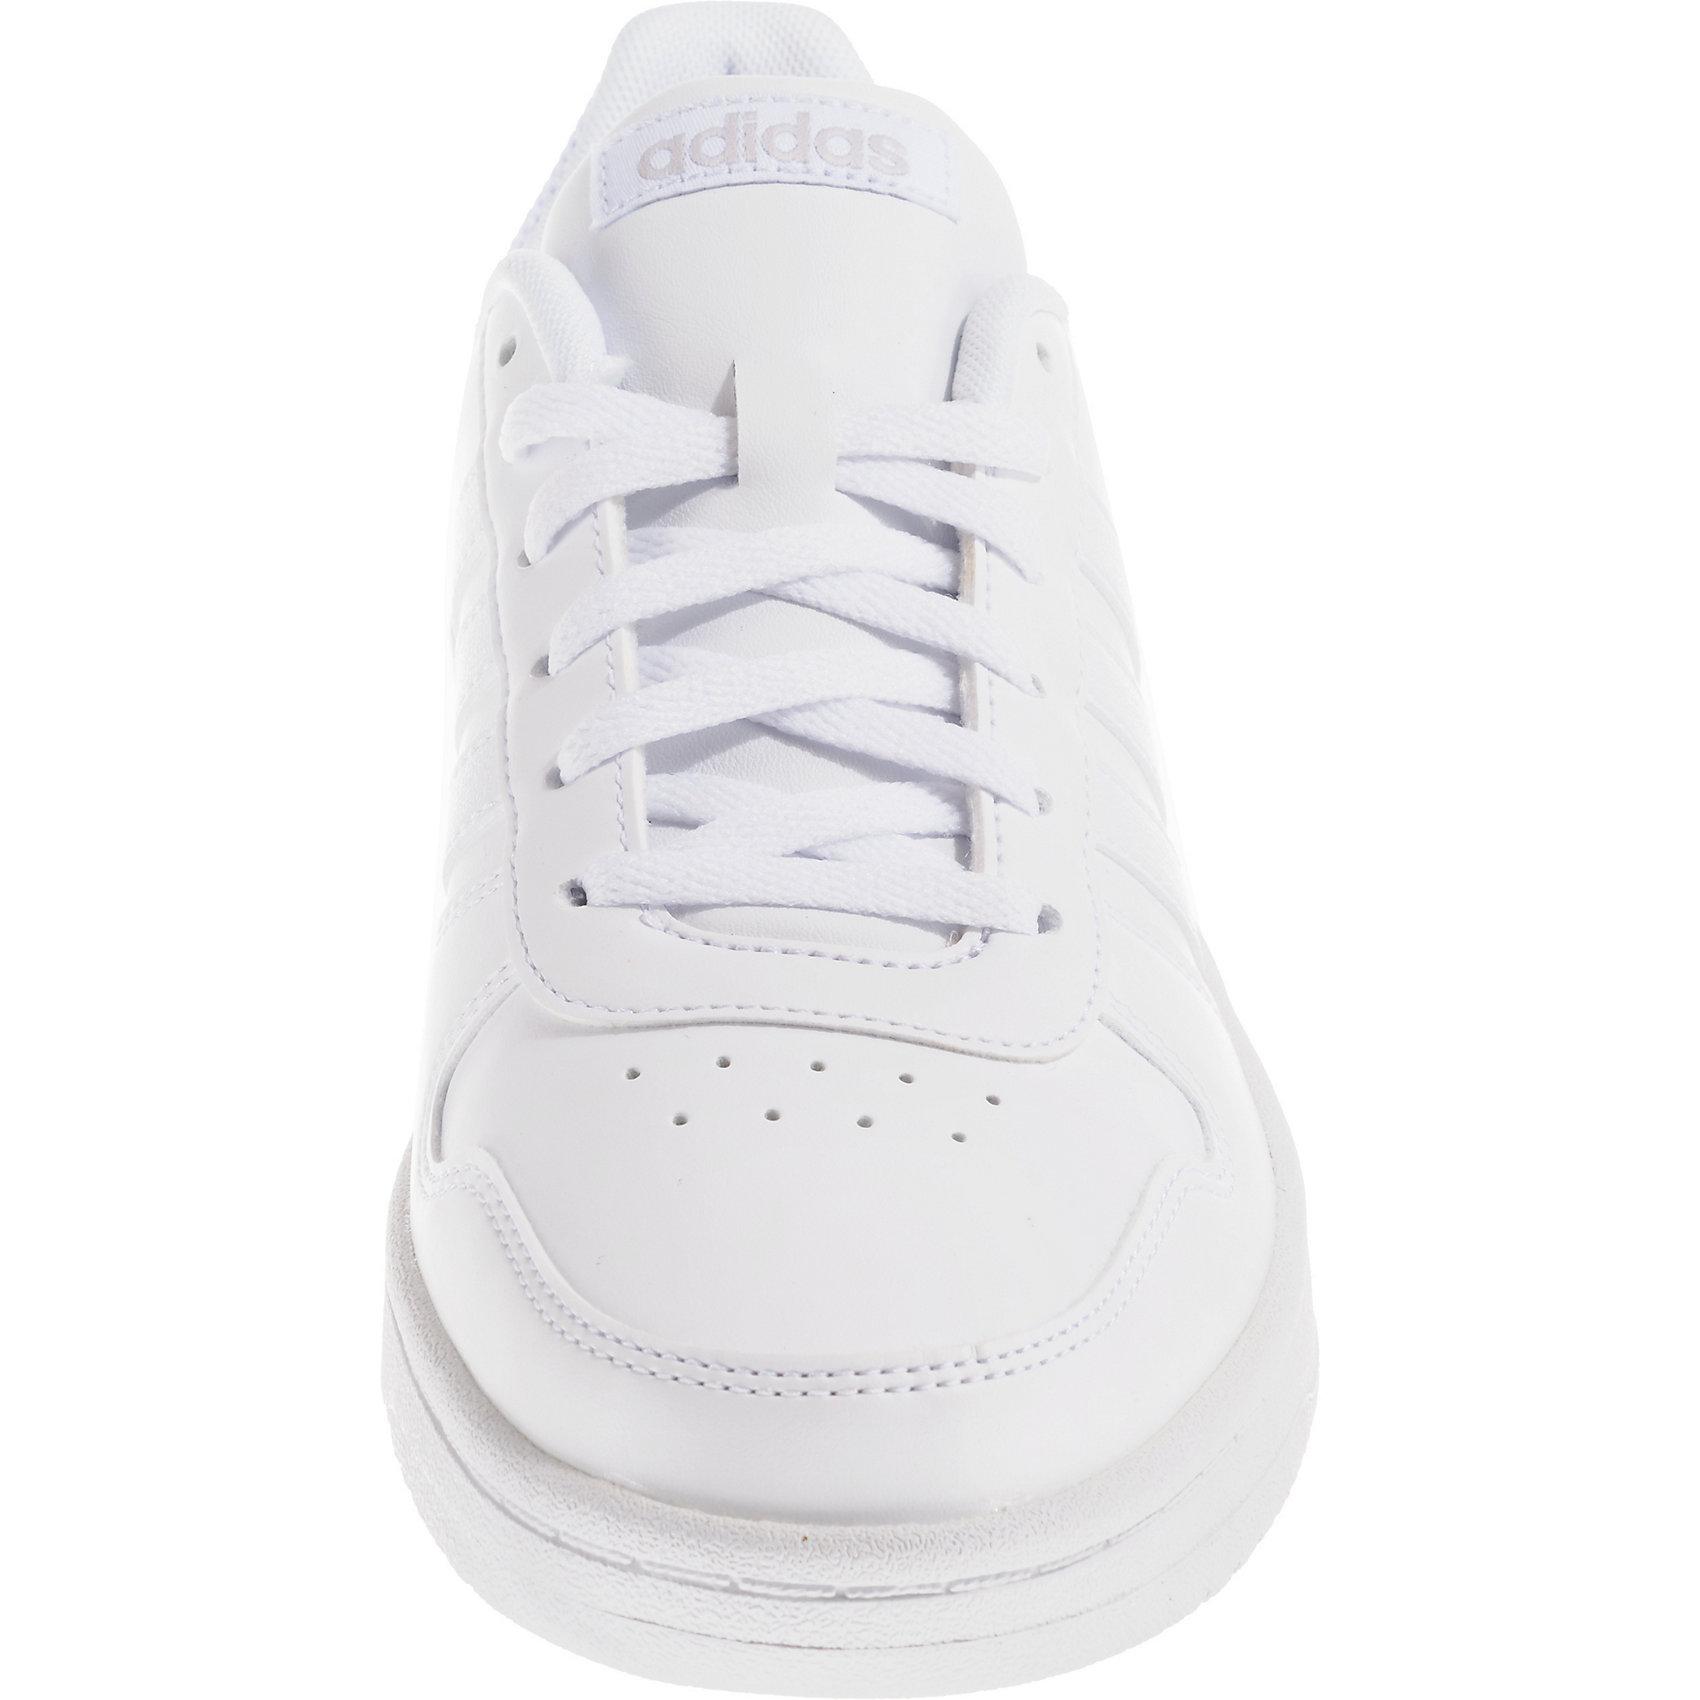 sports shoes dd795 e3950 ... NIKE KD 8 ELITE TUMBLED GREY GREY GREY SZ 12  834185-001  Kevin ...